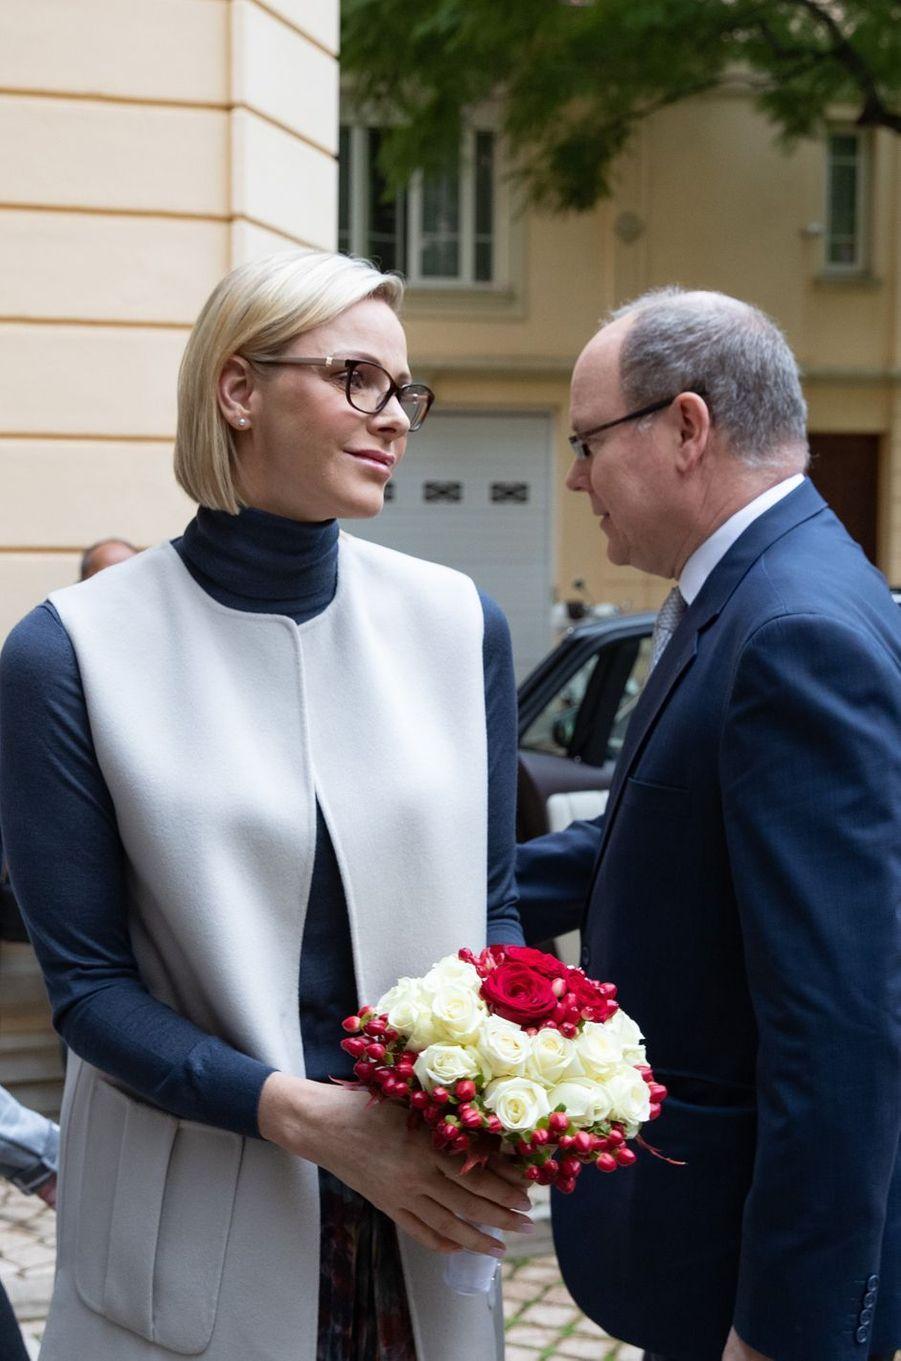 La princesse Charlène et le prince Albert II de Monaco à Monaco, le 15 novembre 2019